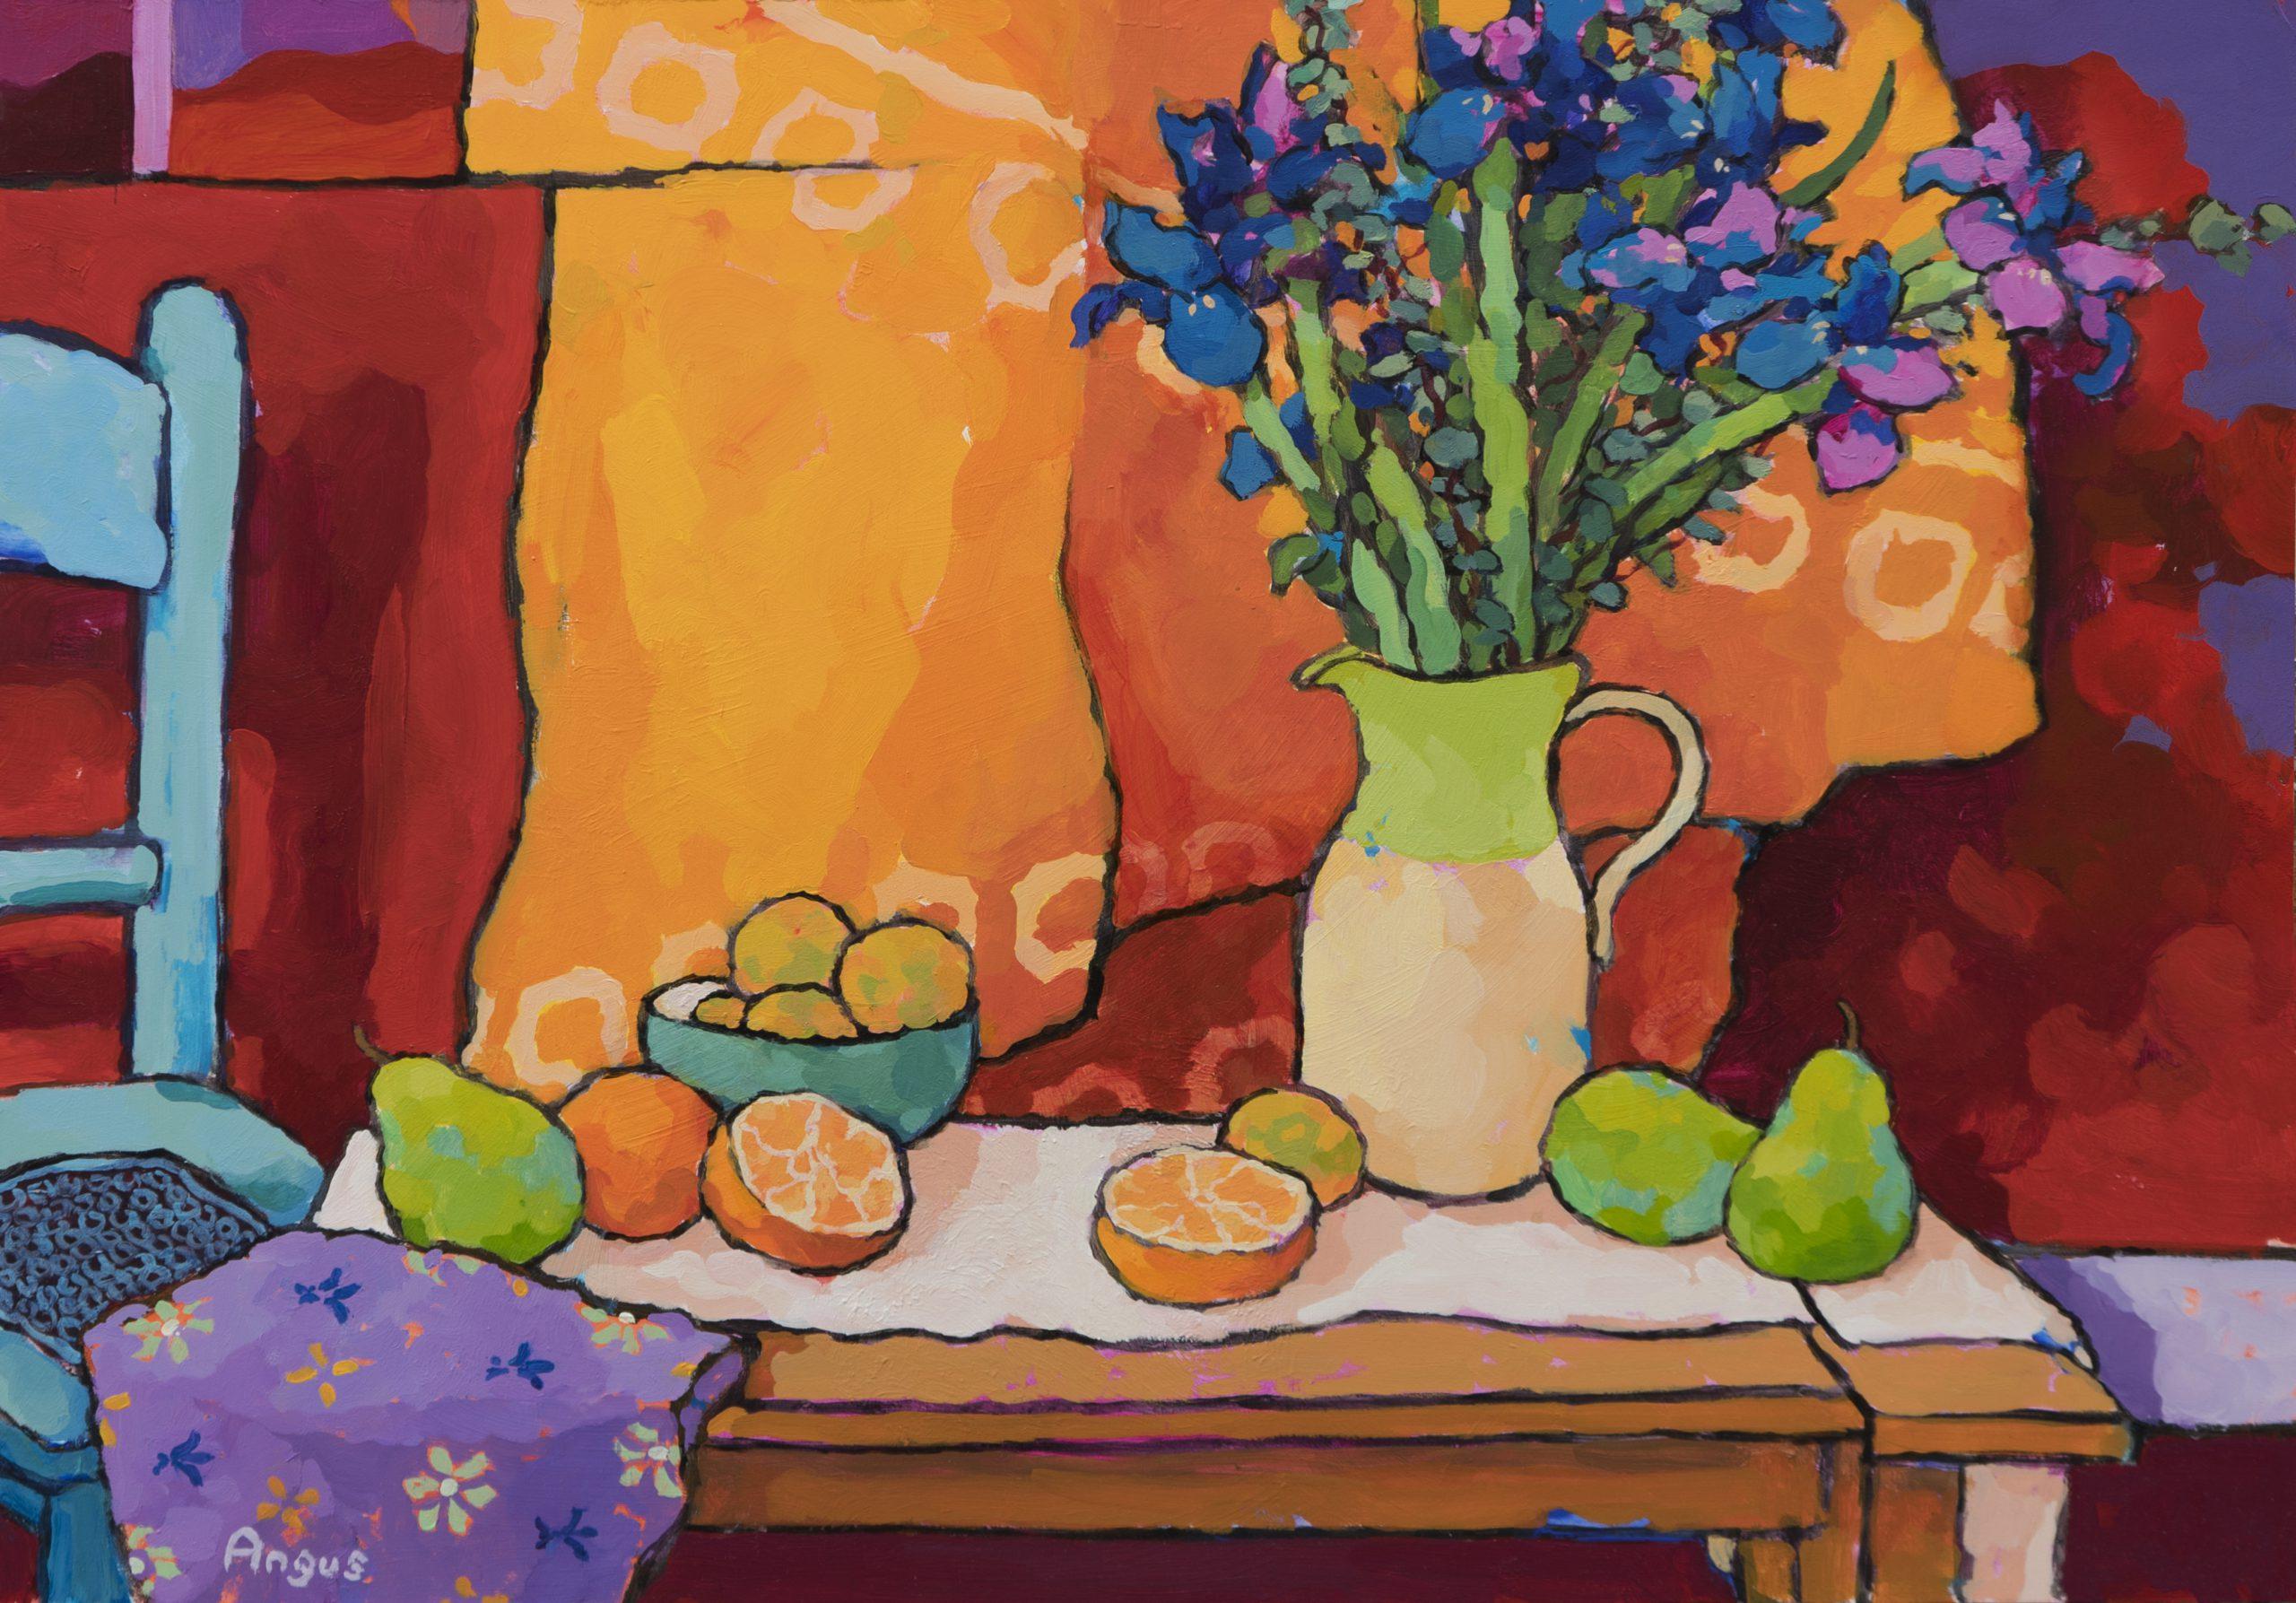 Angus Wilson - Oranges, Pear, & Apricot with Iris